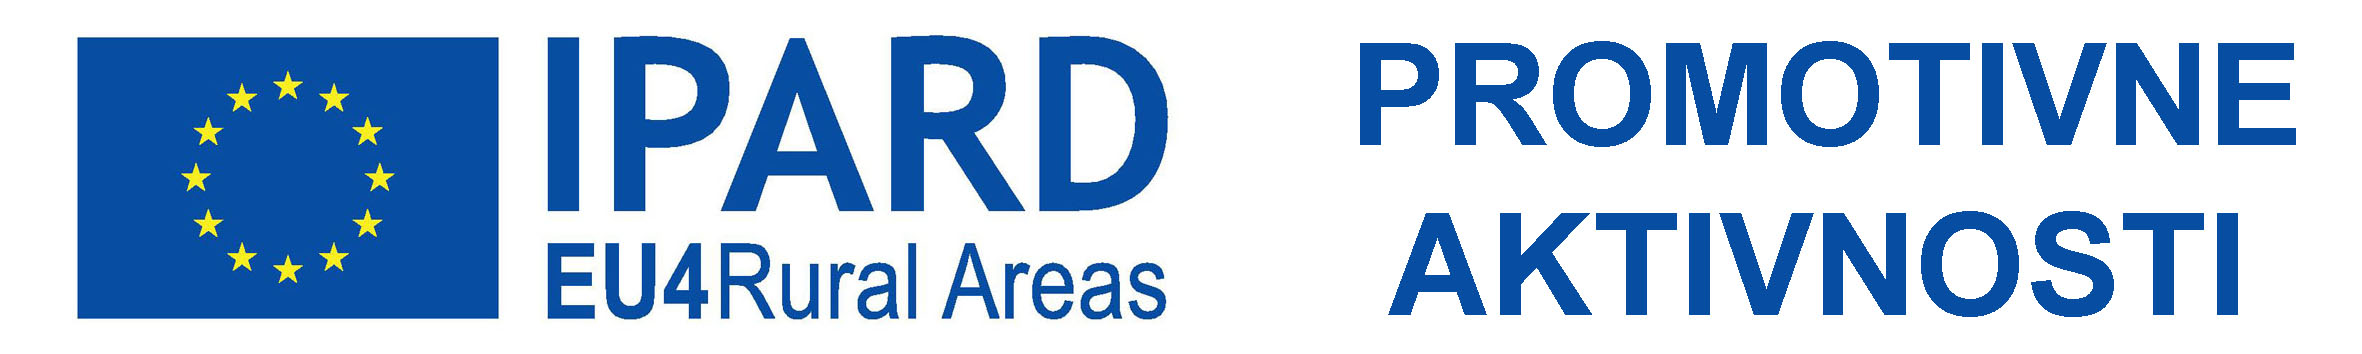 IPARD promocija